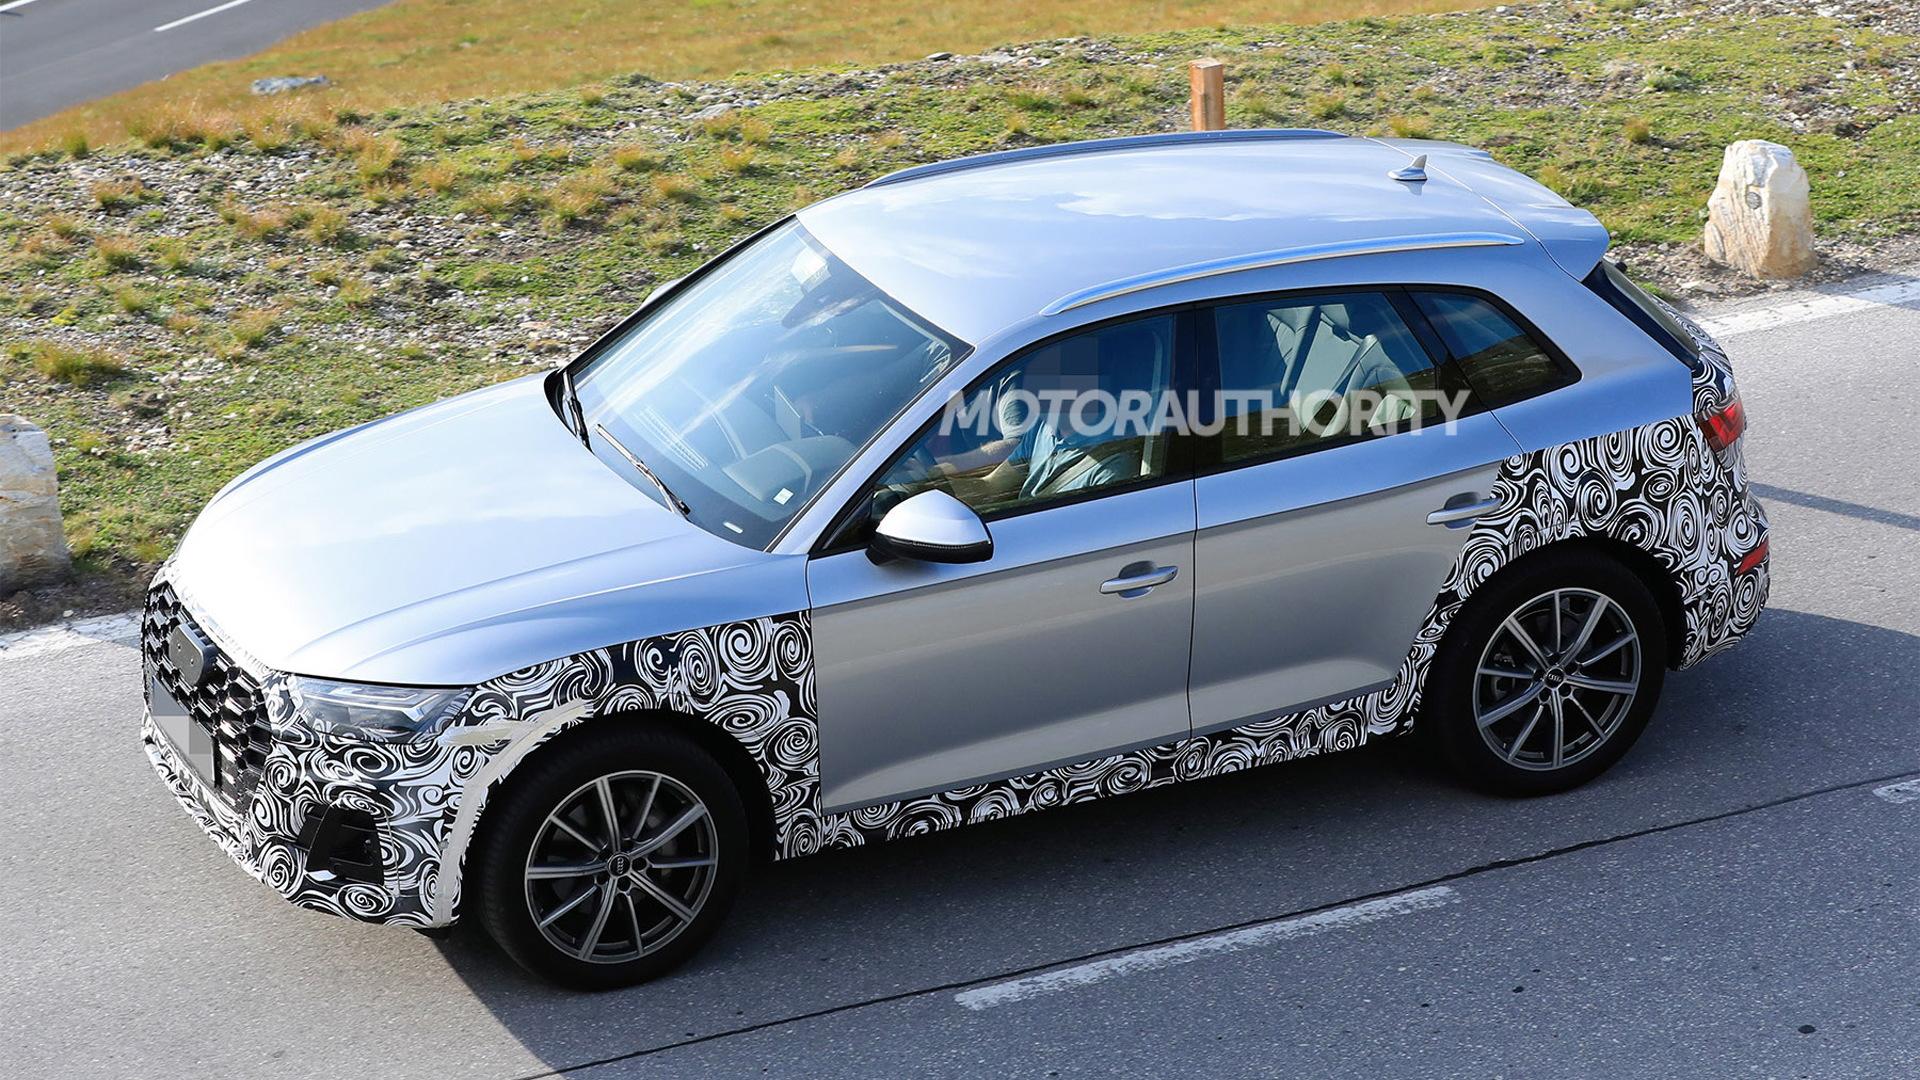 2021 Audi Q5 facelift spy shots - Photo credit: S. Baldauf/SB-Medien